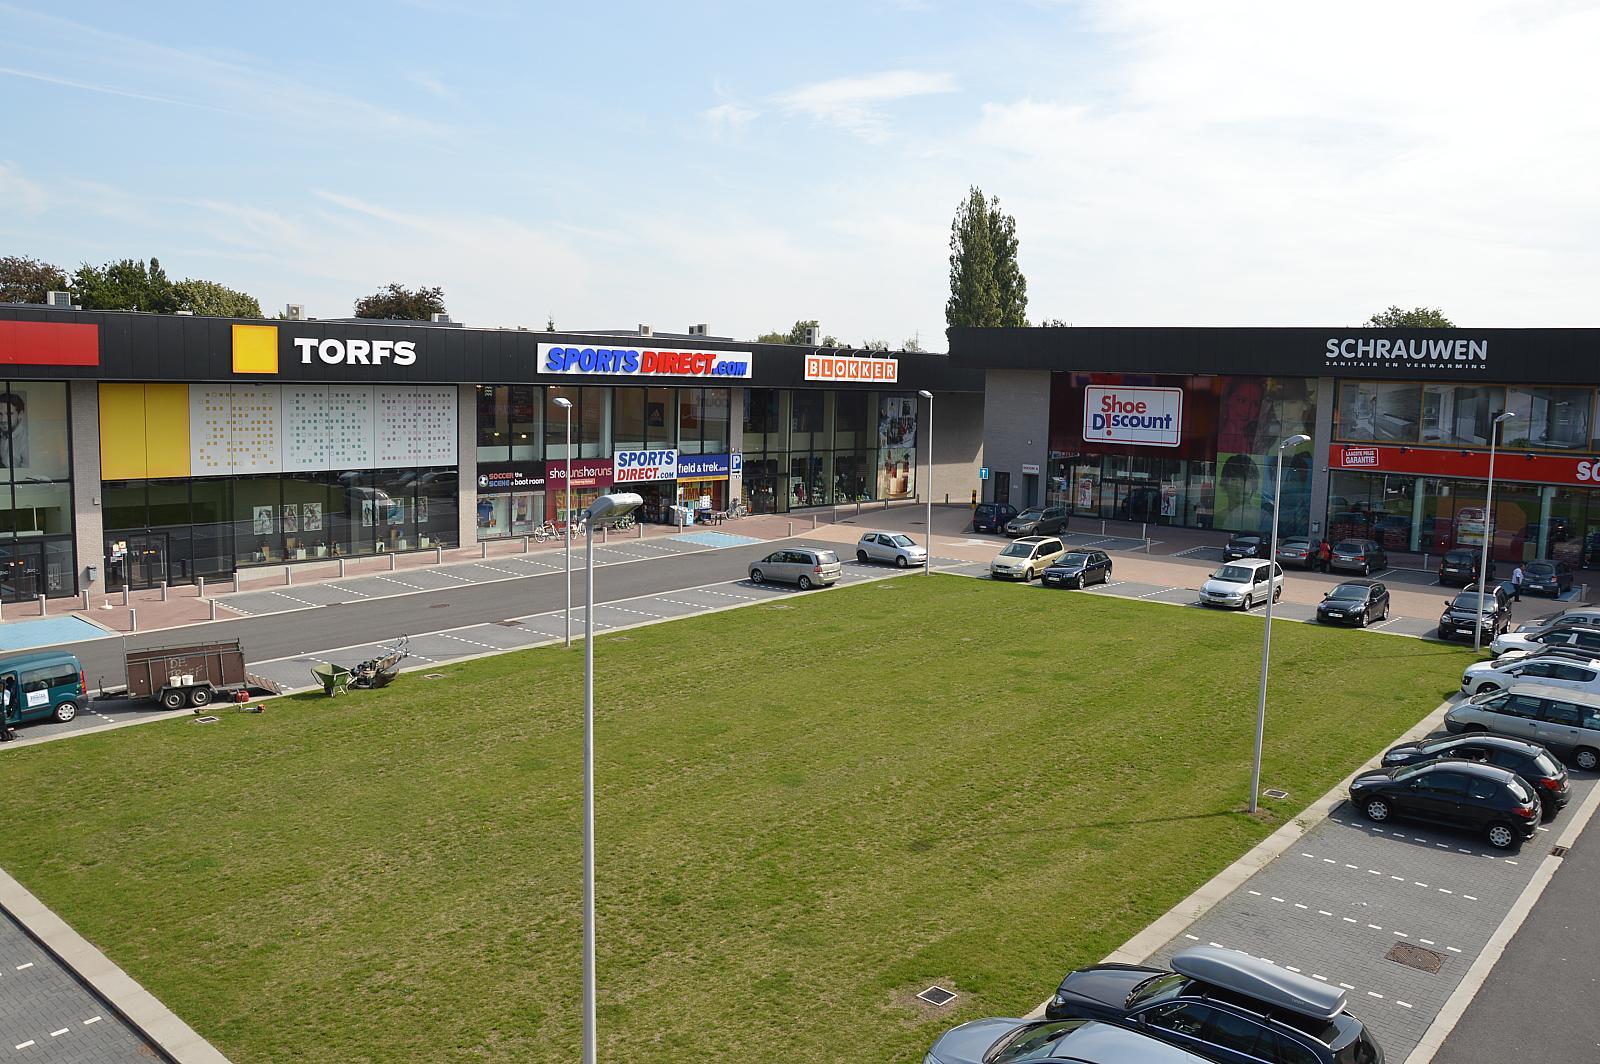 399-winkelcomplex-xxl-turnhout